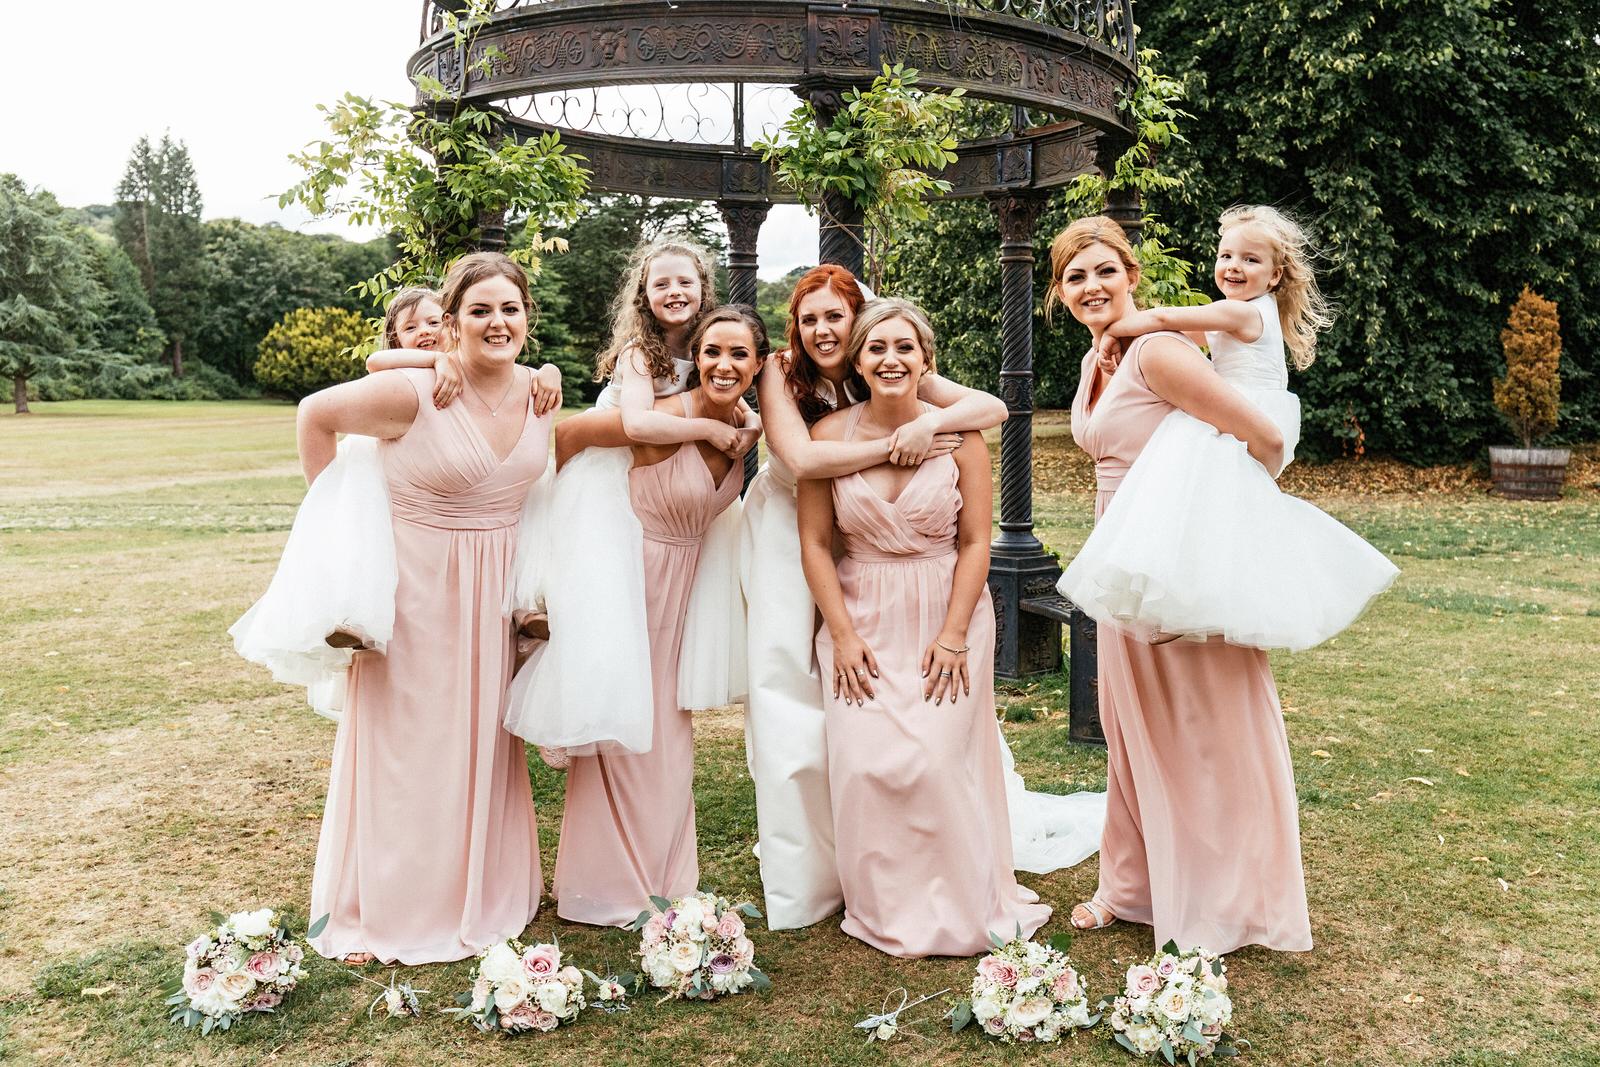 Beamish-Hall-Wedding-Photographer-035.jpg